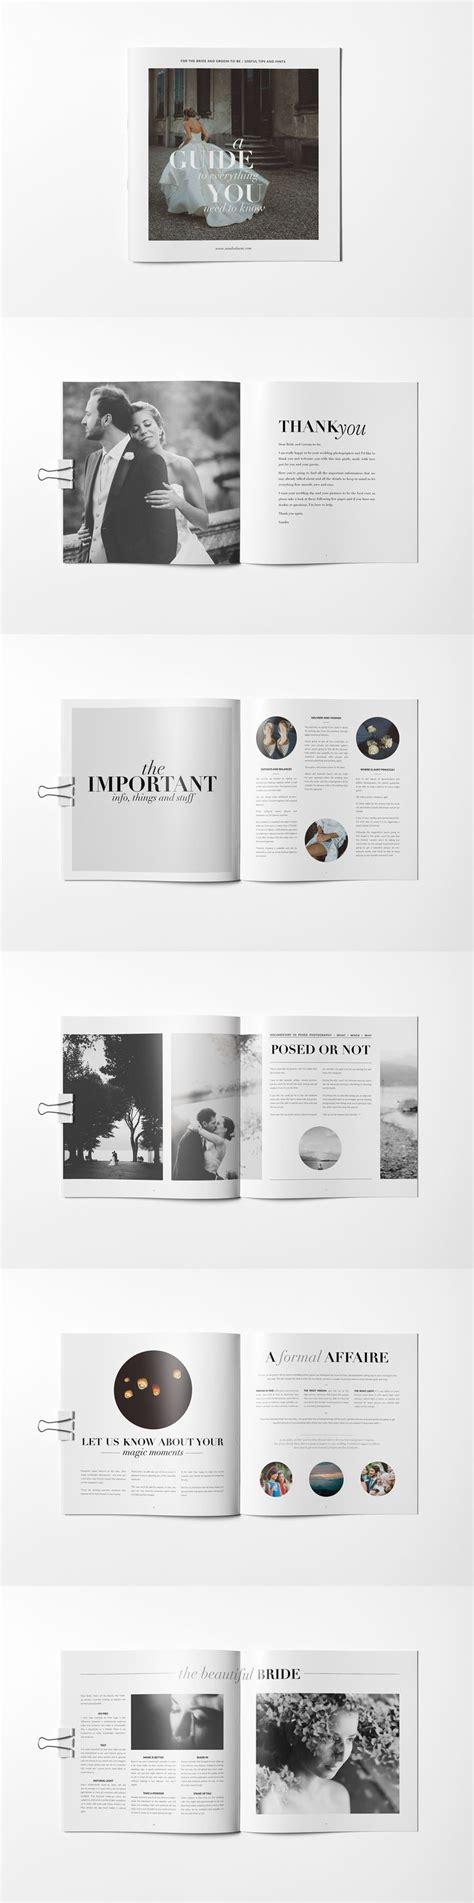 Wedding Suit Brochure by 25 Best Ideas About Wedding Brochure On